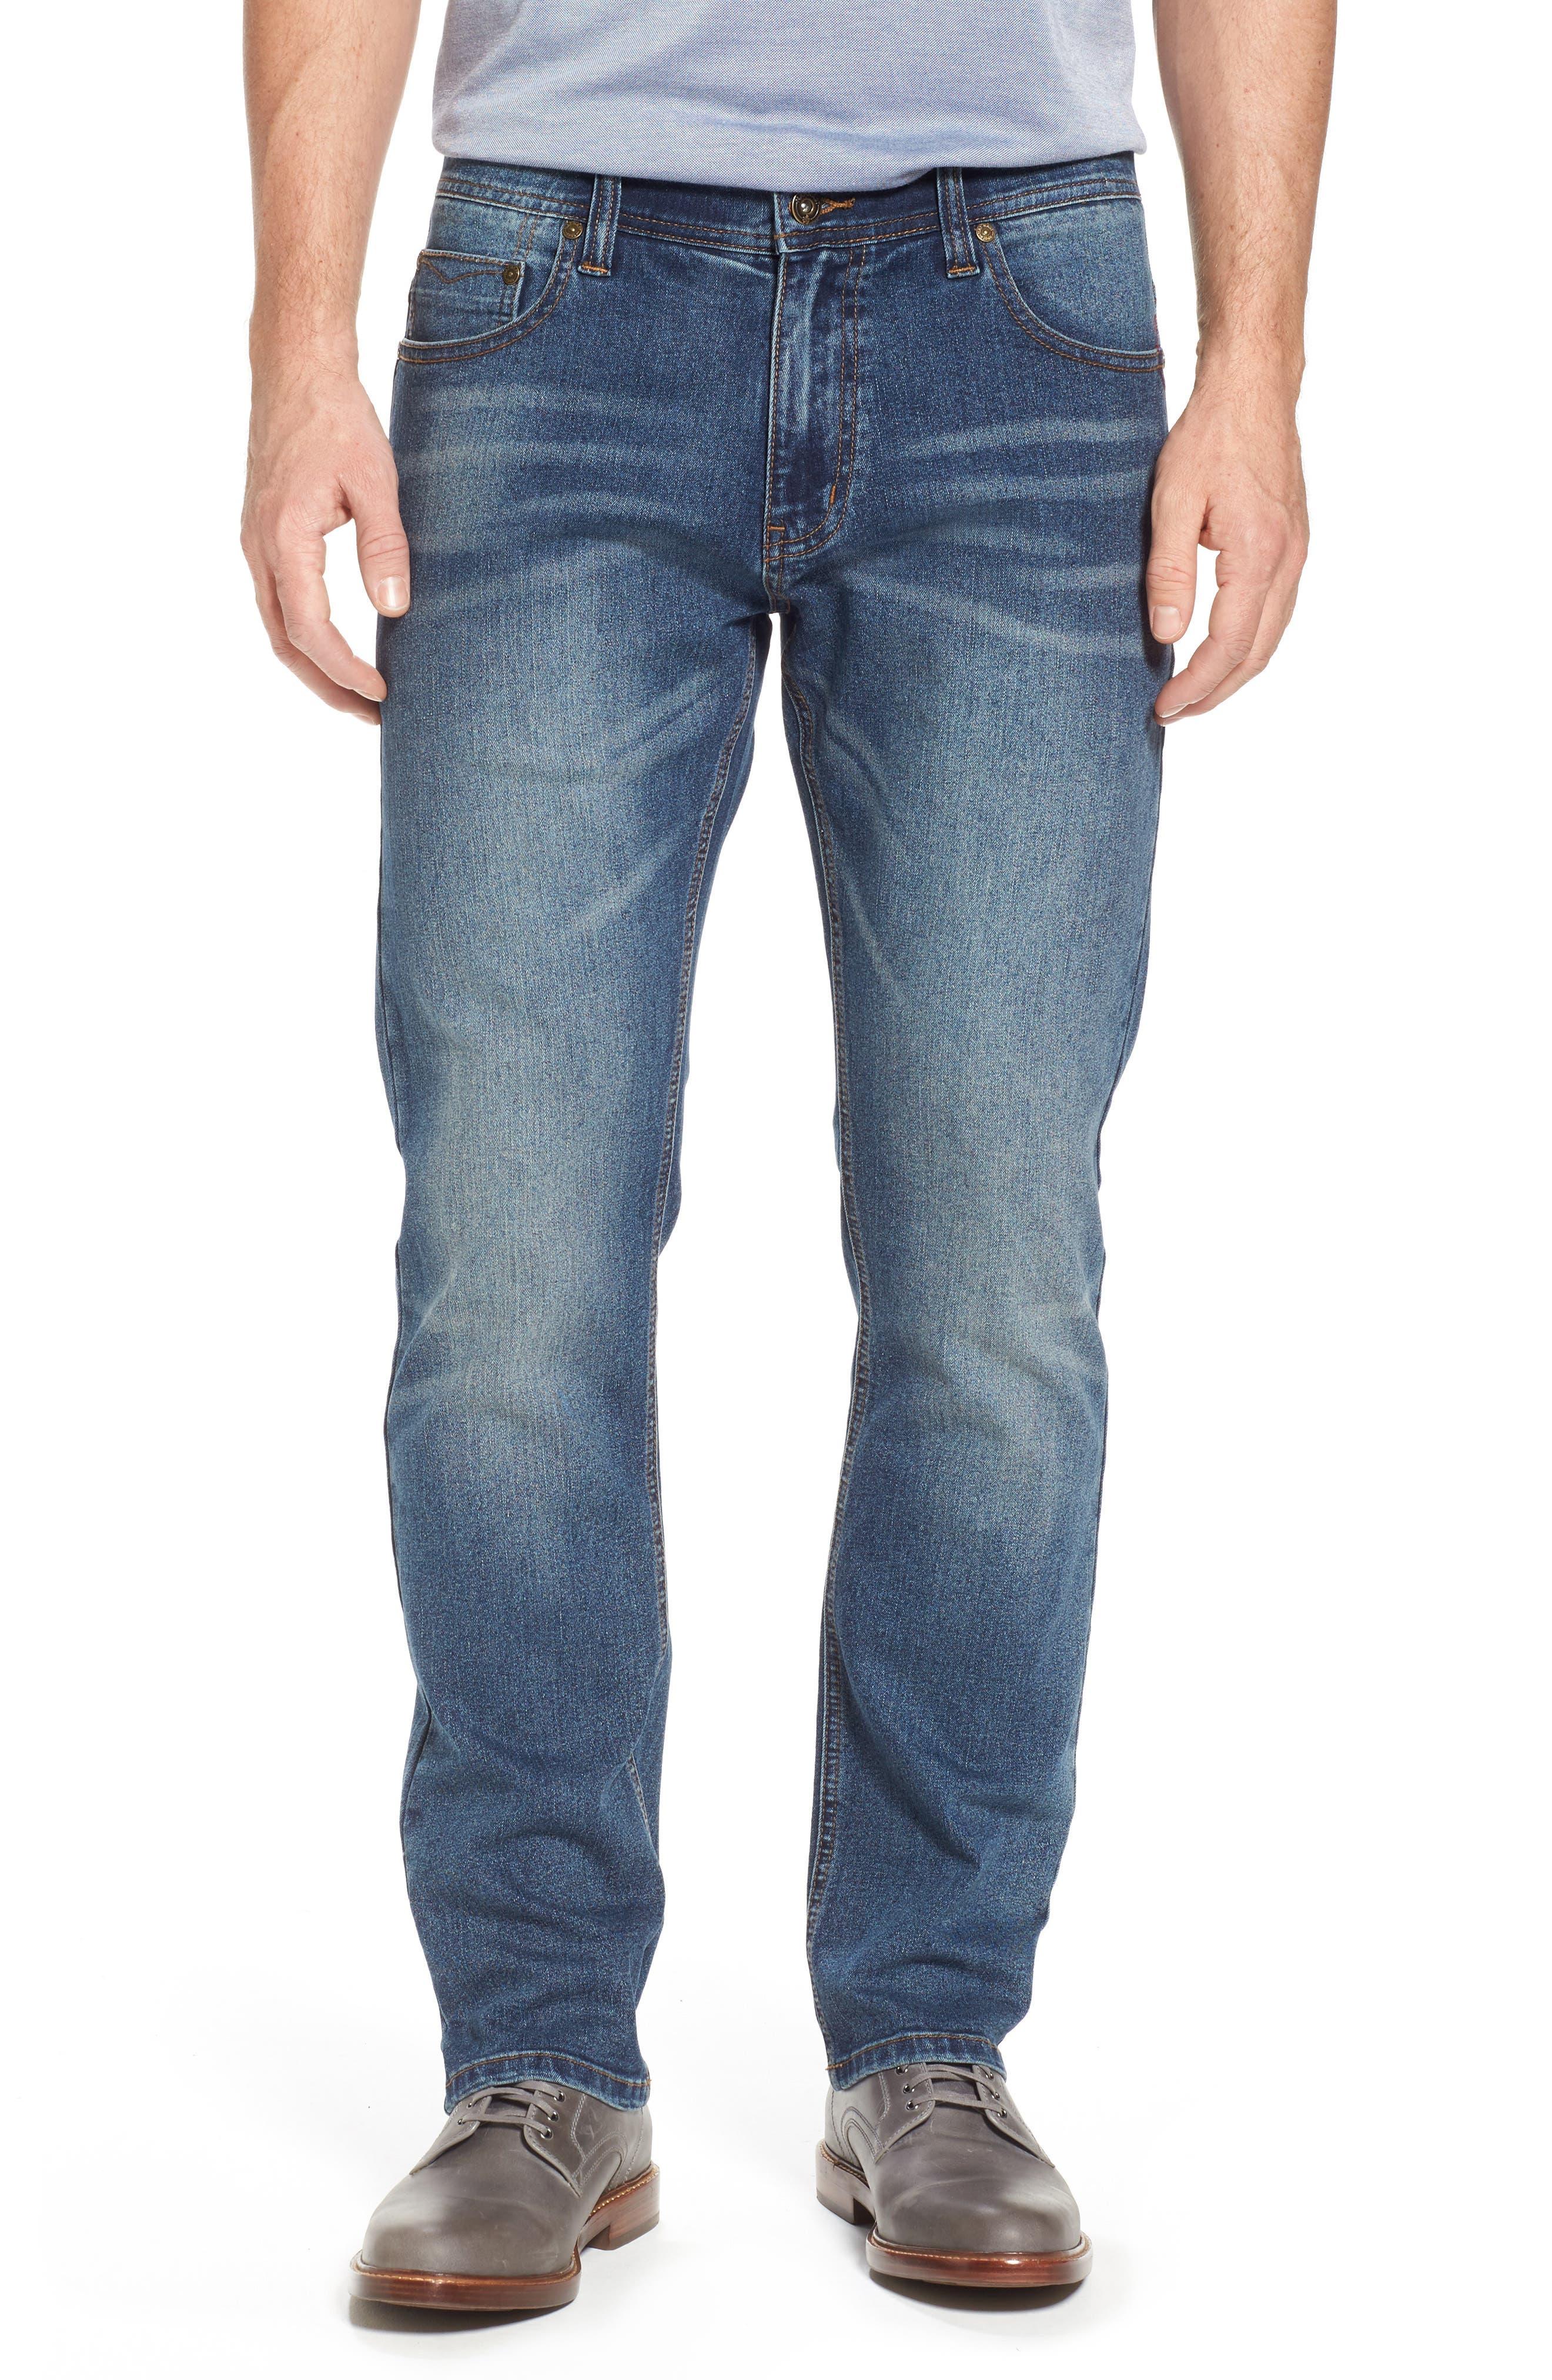 Maverick Stretch Slim Fit Jeans,                         Main,                         color, MAVERICK WASH